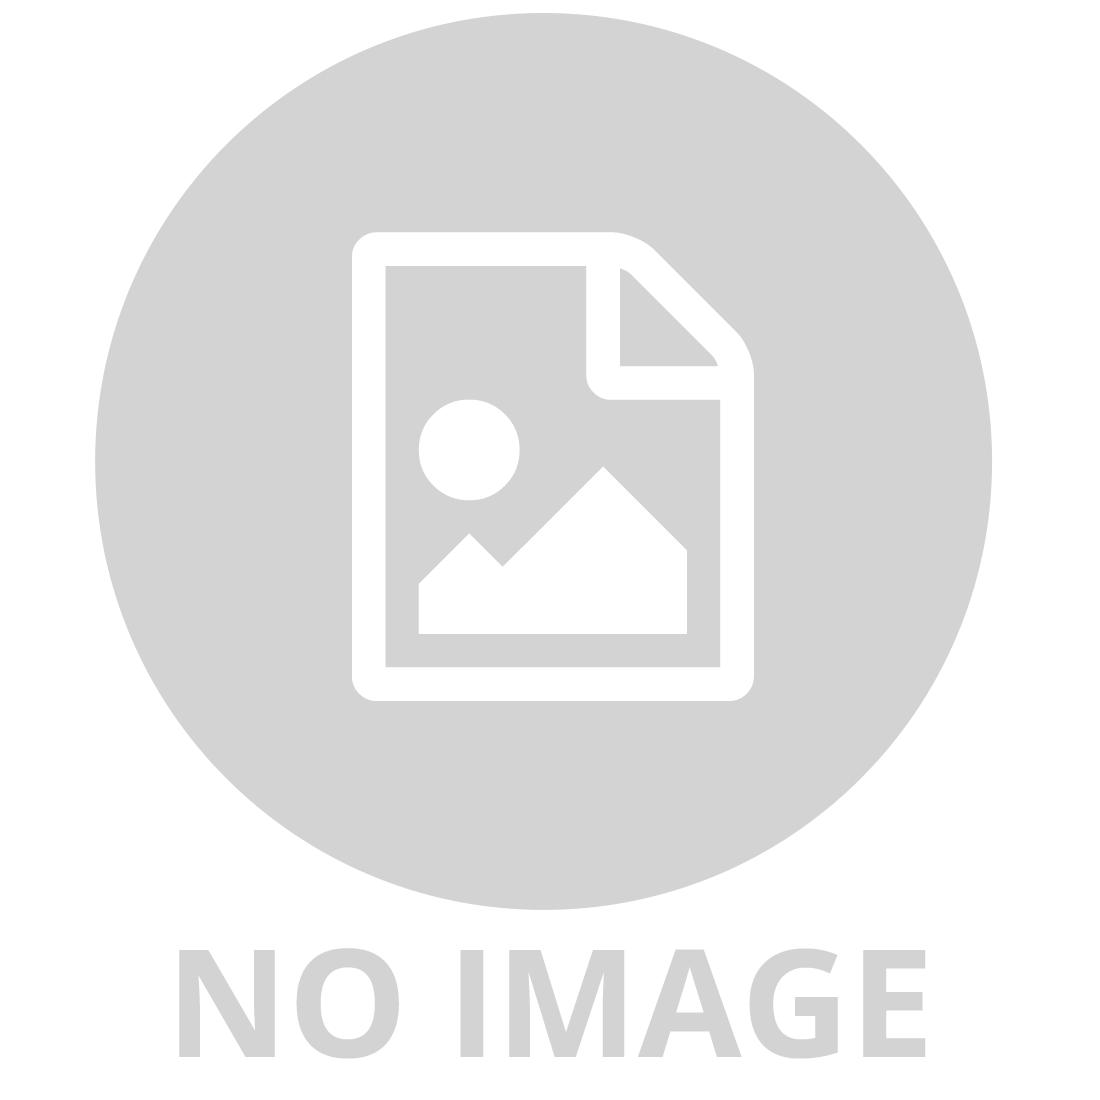 MISS MELODY DRESS MY HORSE